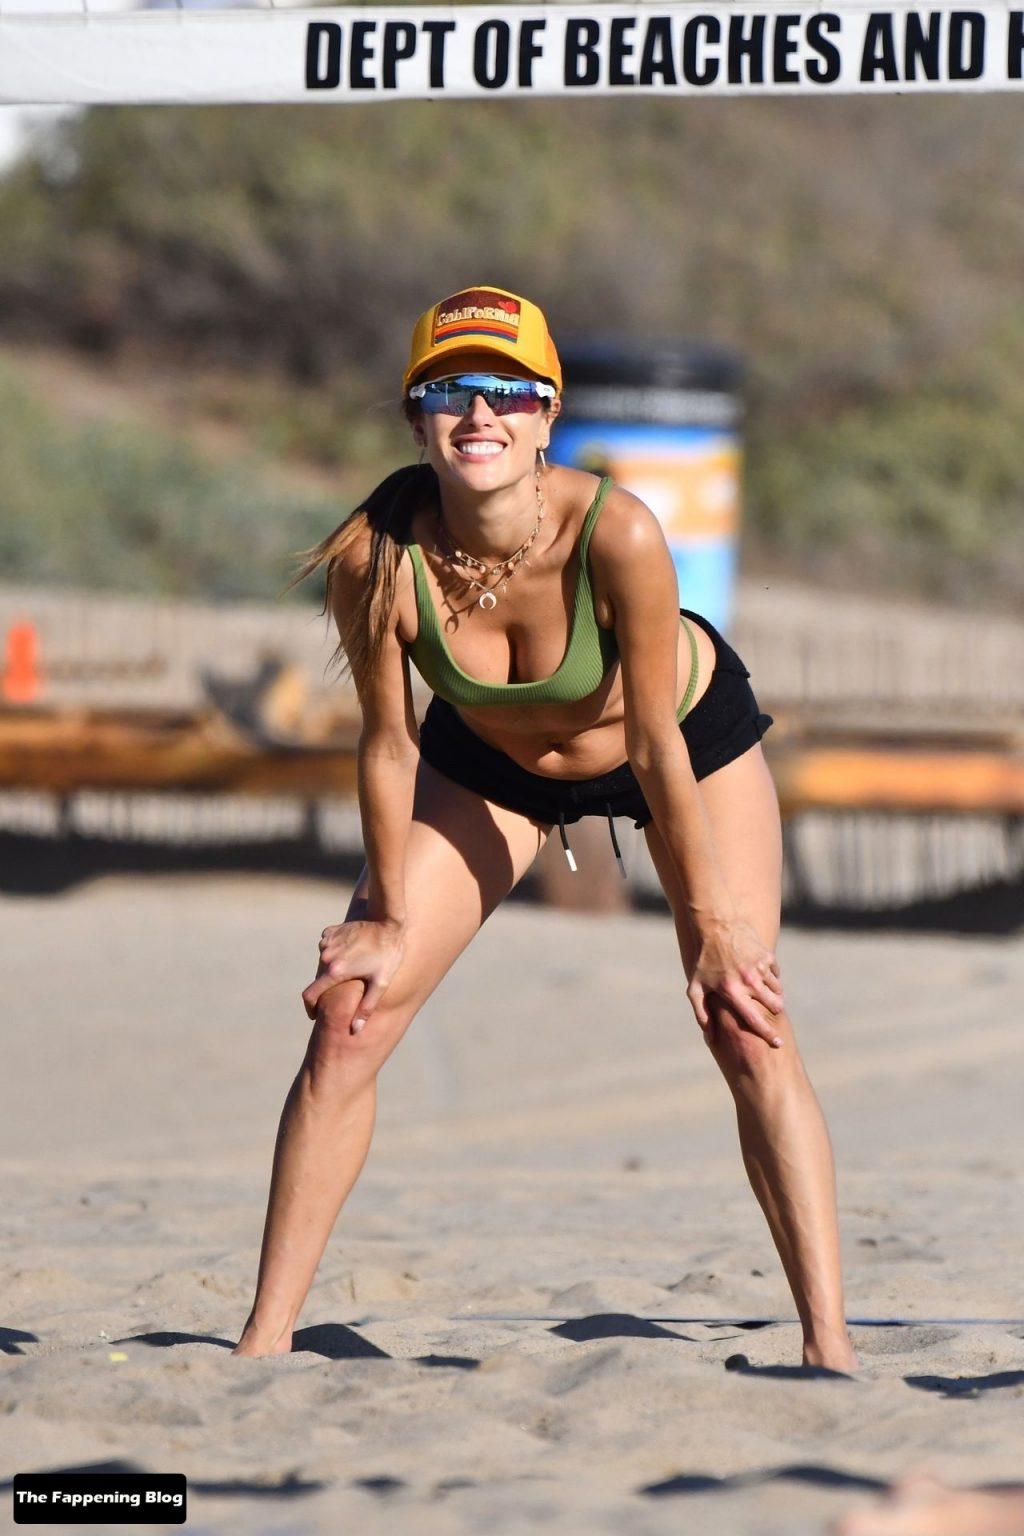 Leggy Alessandra Ambrosio Plays Beach Volleyball With Friends (150 Photos)